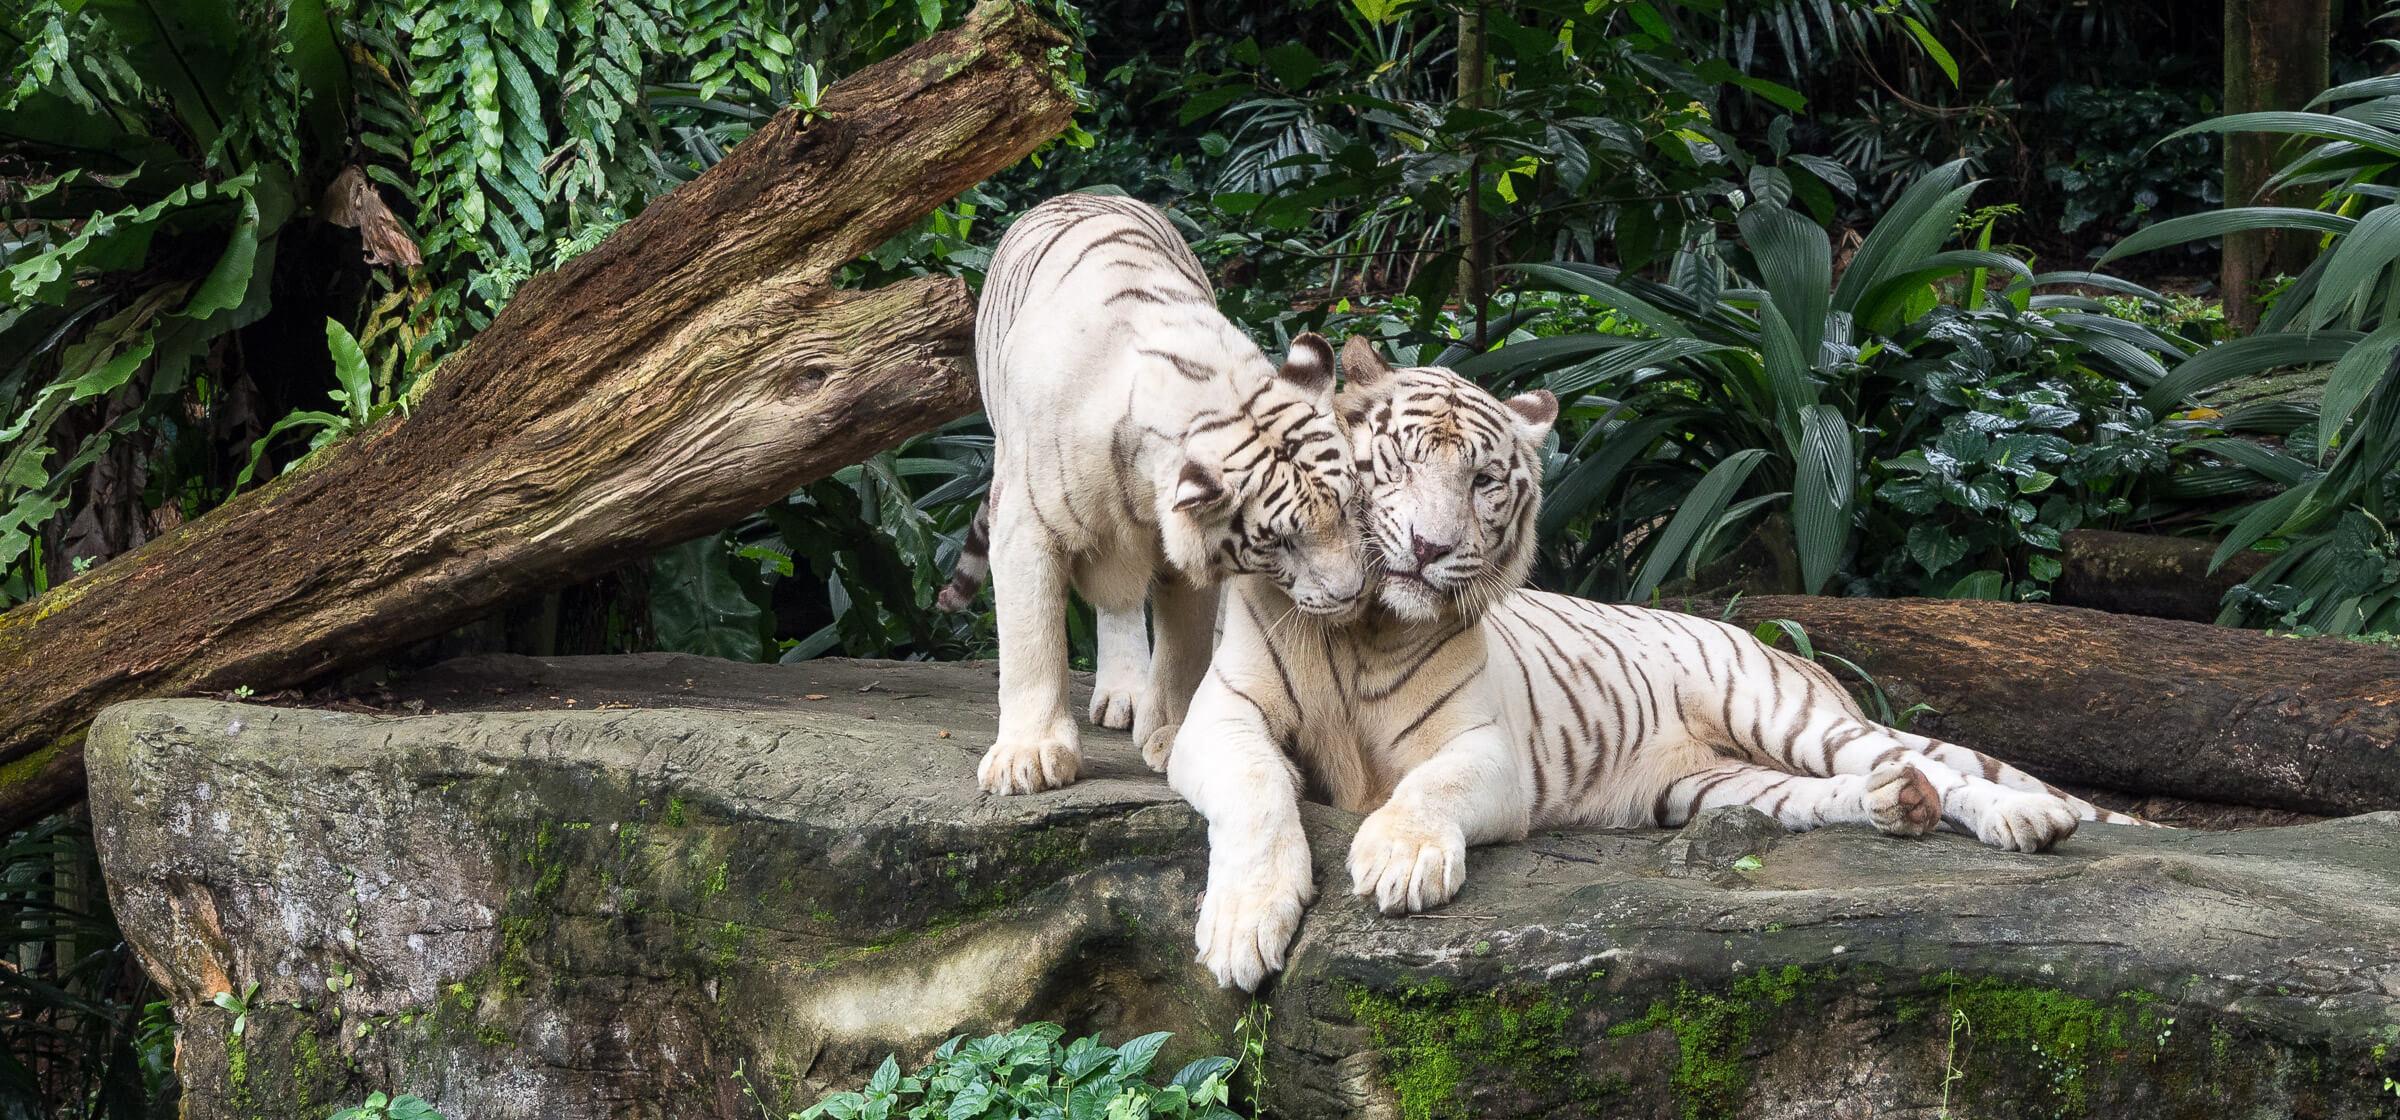 White Tigers, Singapore Zoo, Singapore